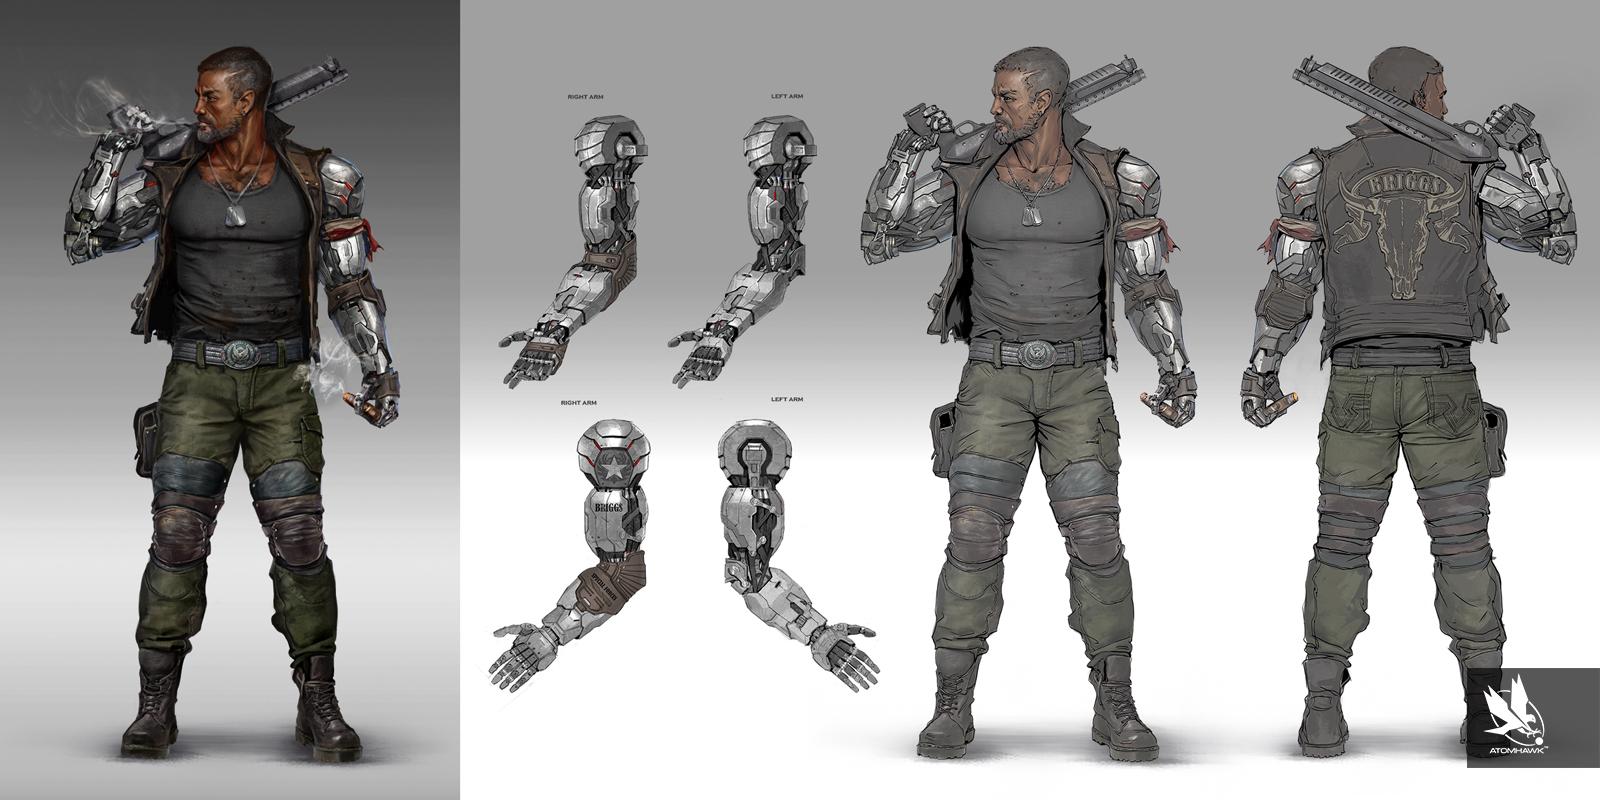 Atomhawk_Warner-Bros-NetherRealm_Mortal-Kombat-11_Concept-Art_Character-Design_Jax-Briggs_Present_1.jpg